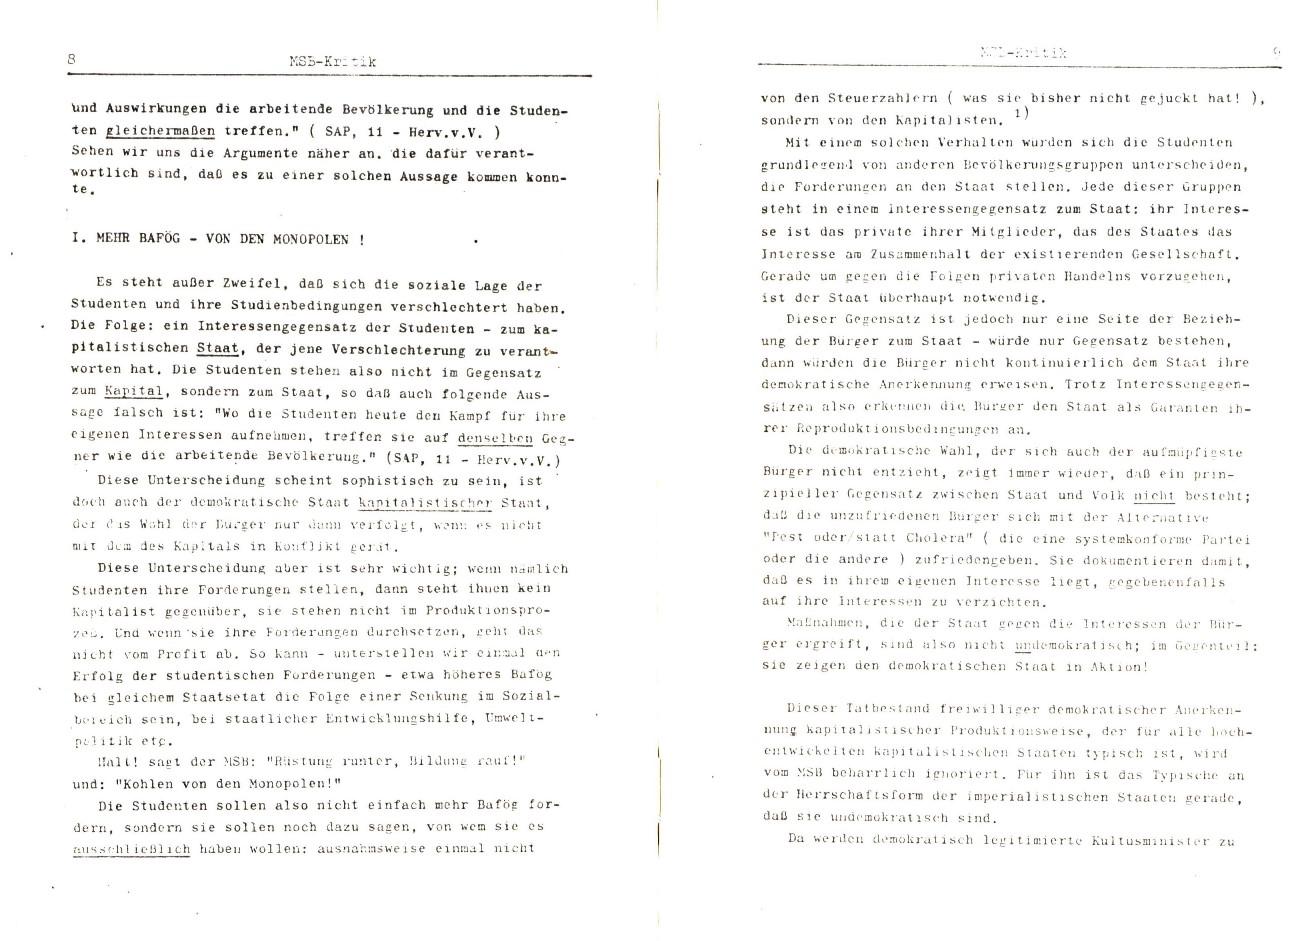 Muenster_SHO_1977_Studenteninteressen_05